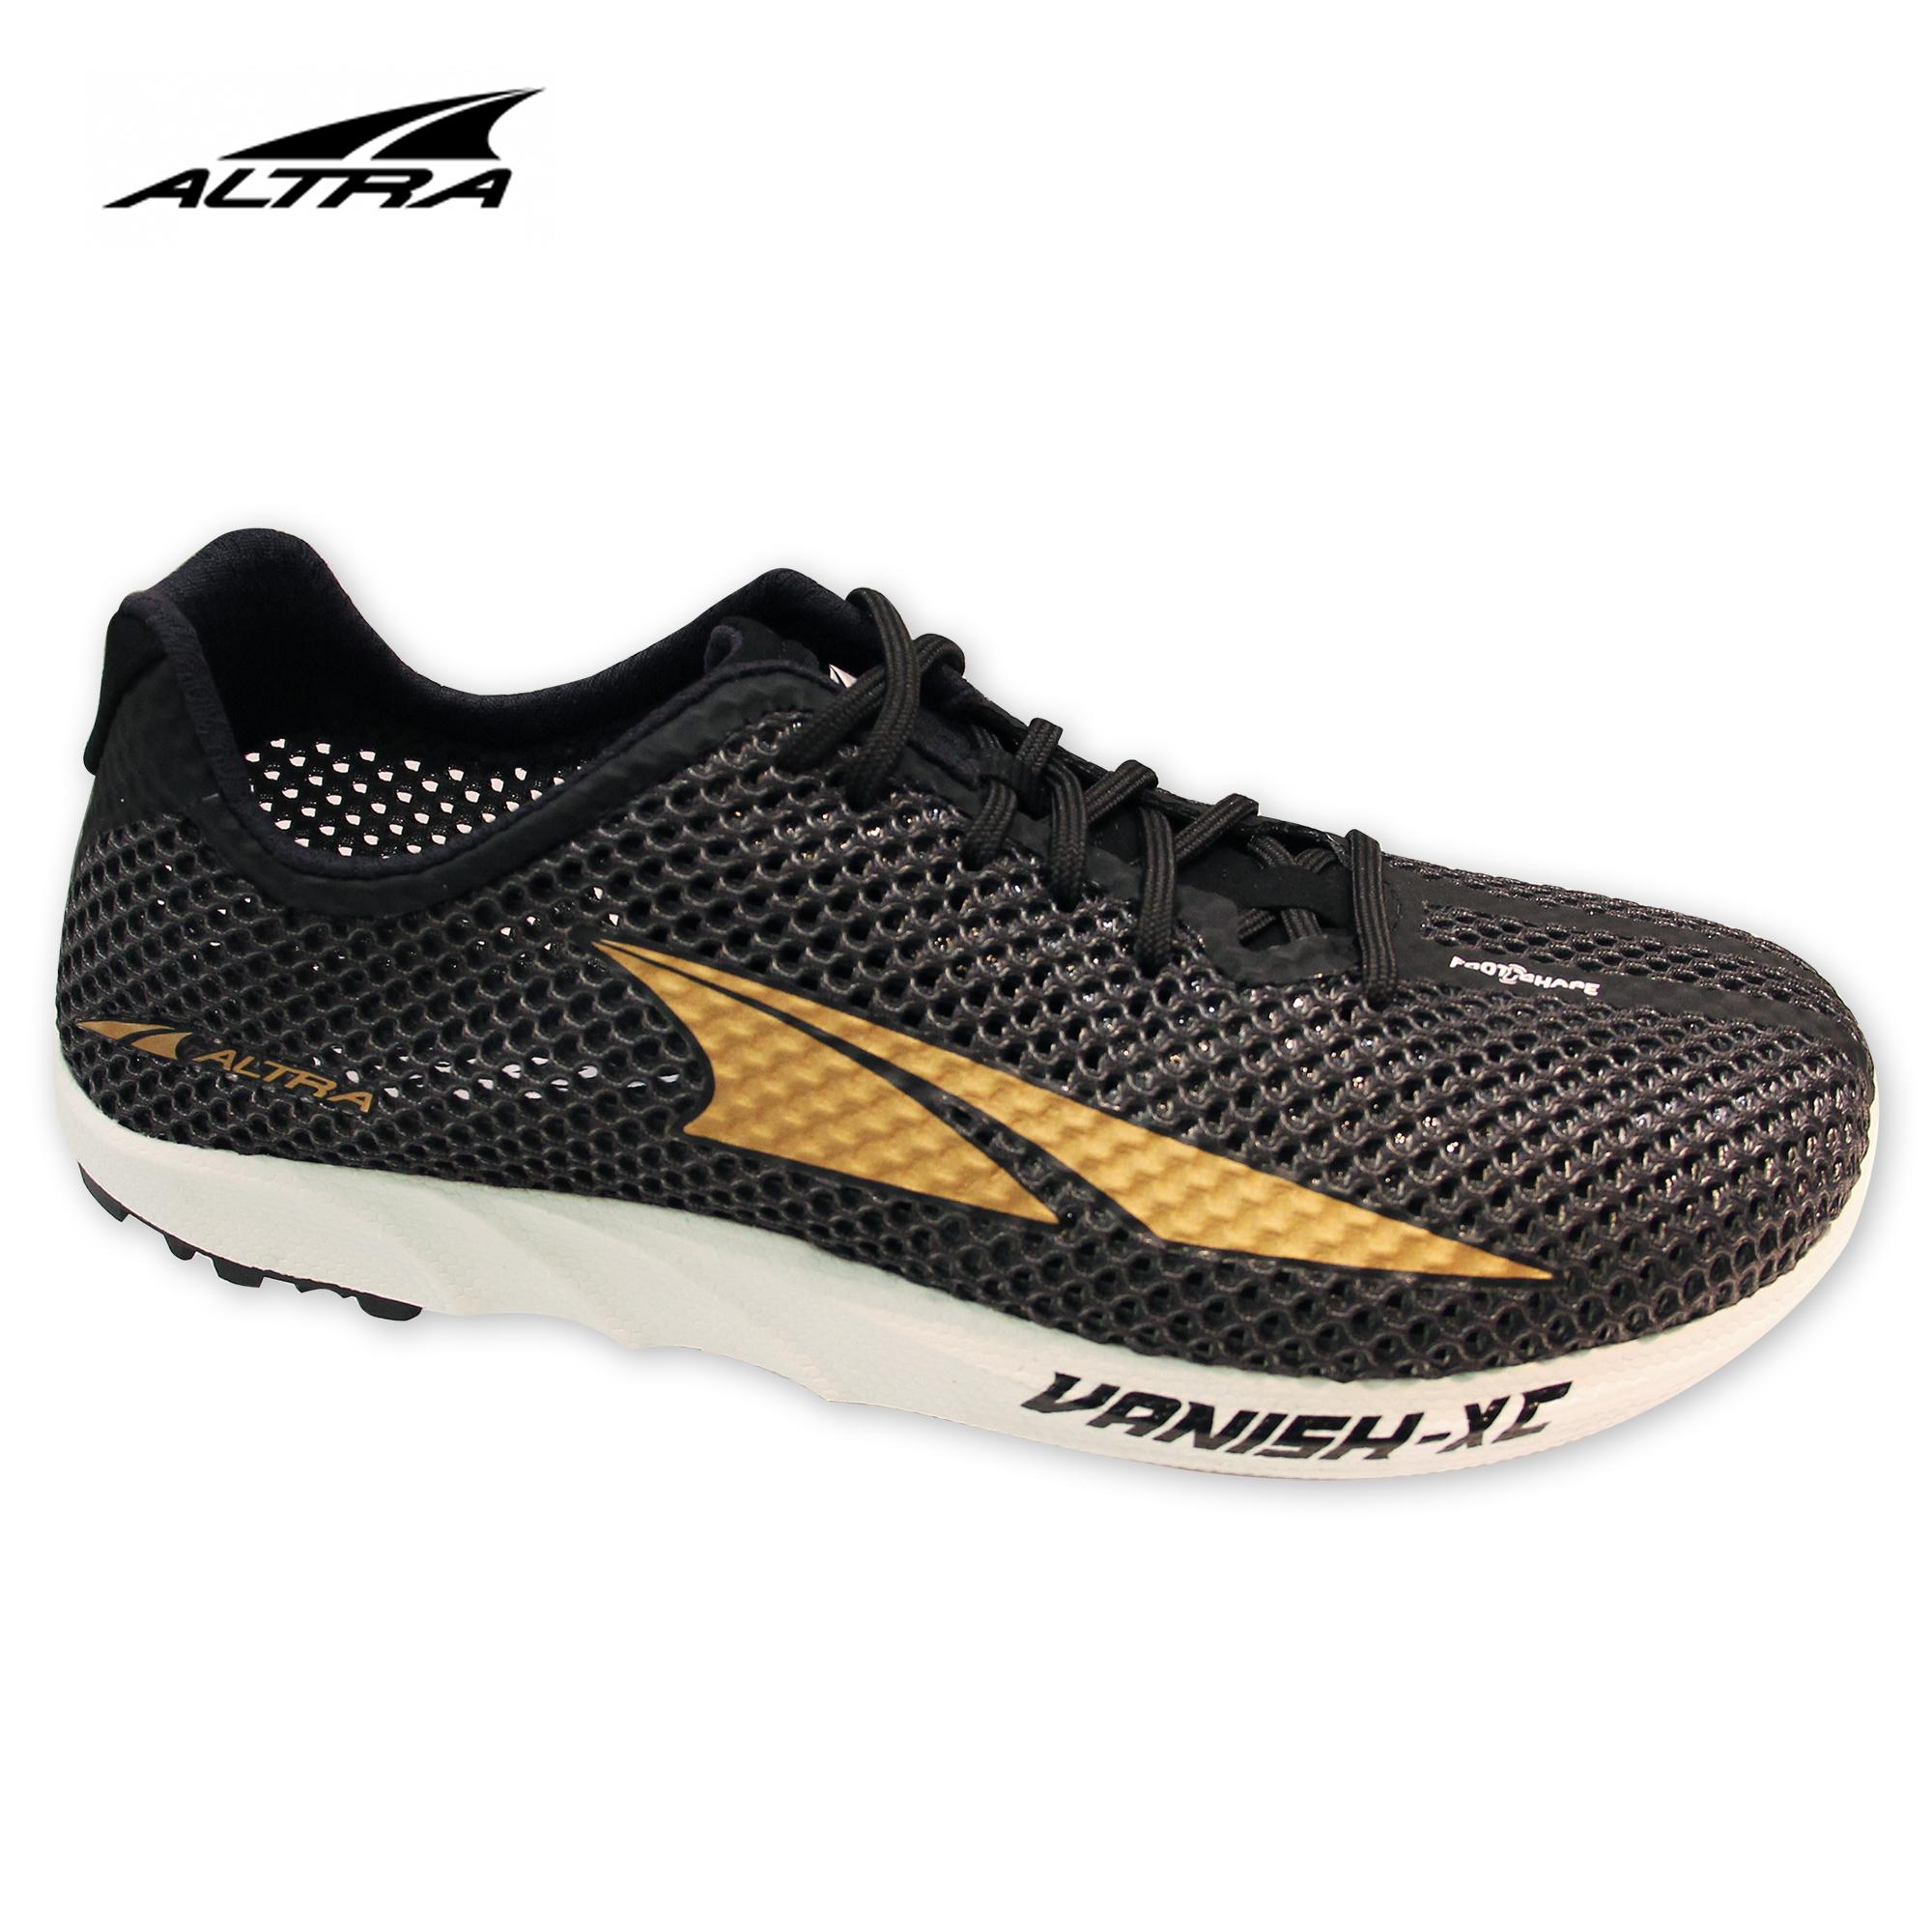 ALTRA FOOTWEAR VANISH XC RUNNING SHOES